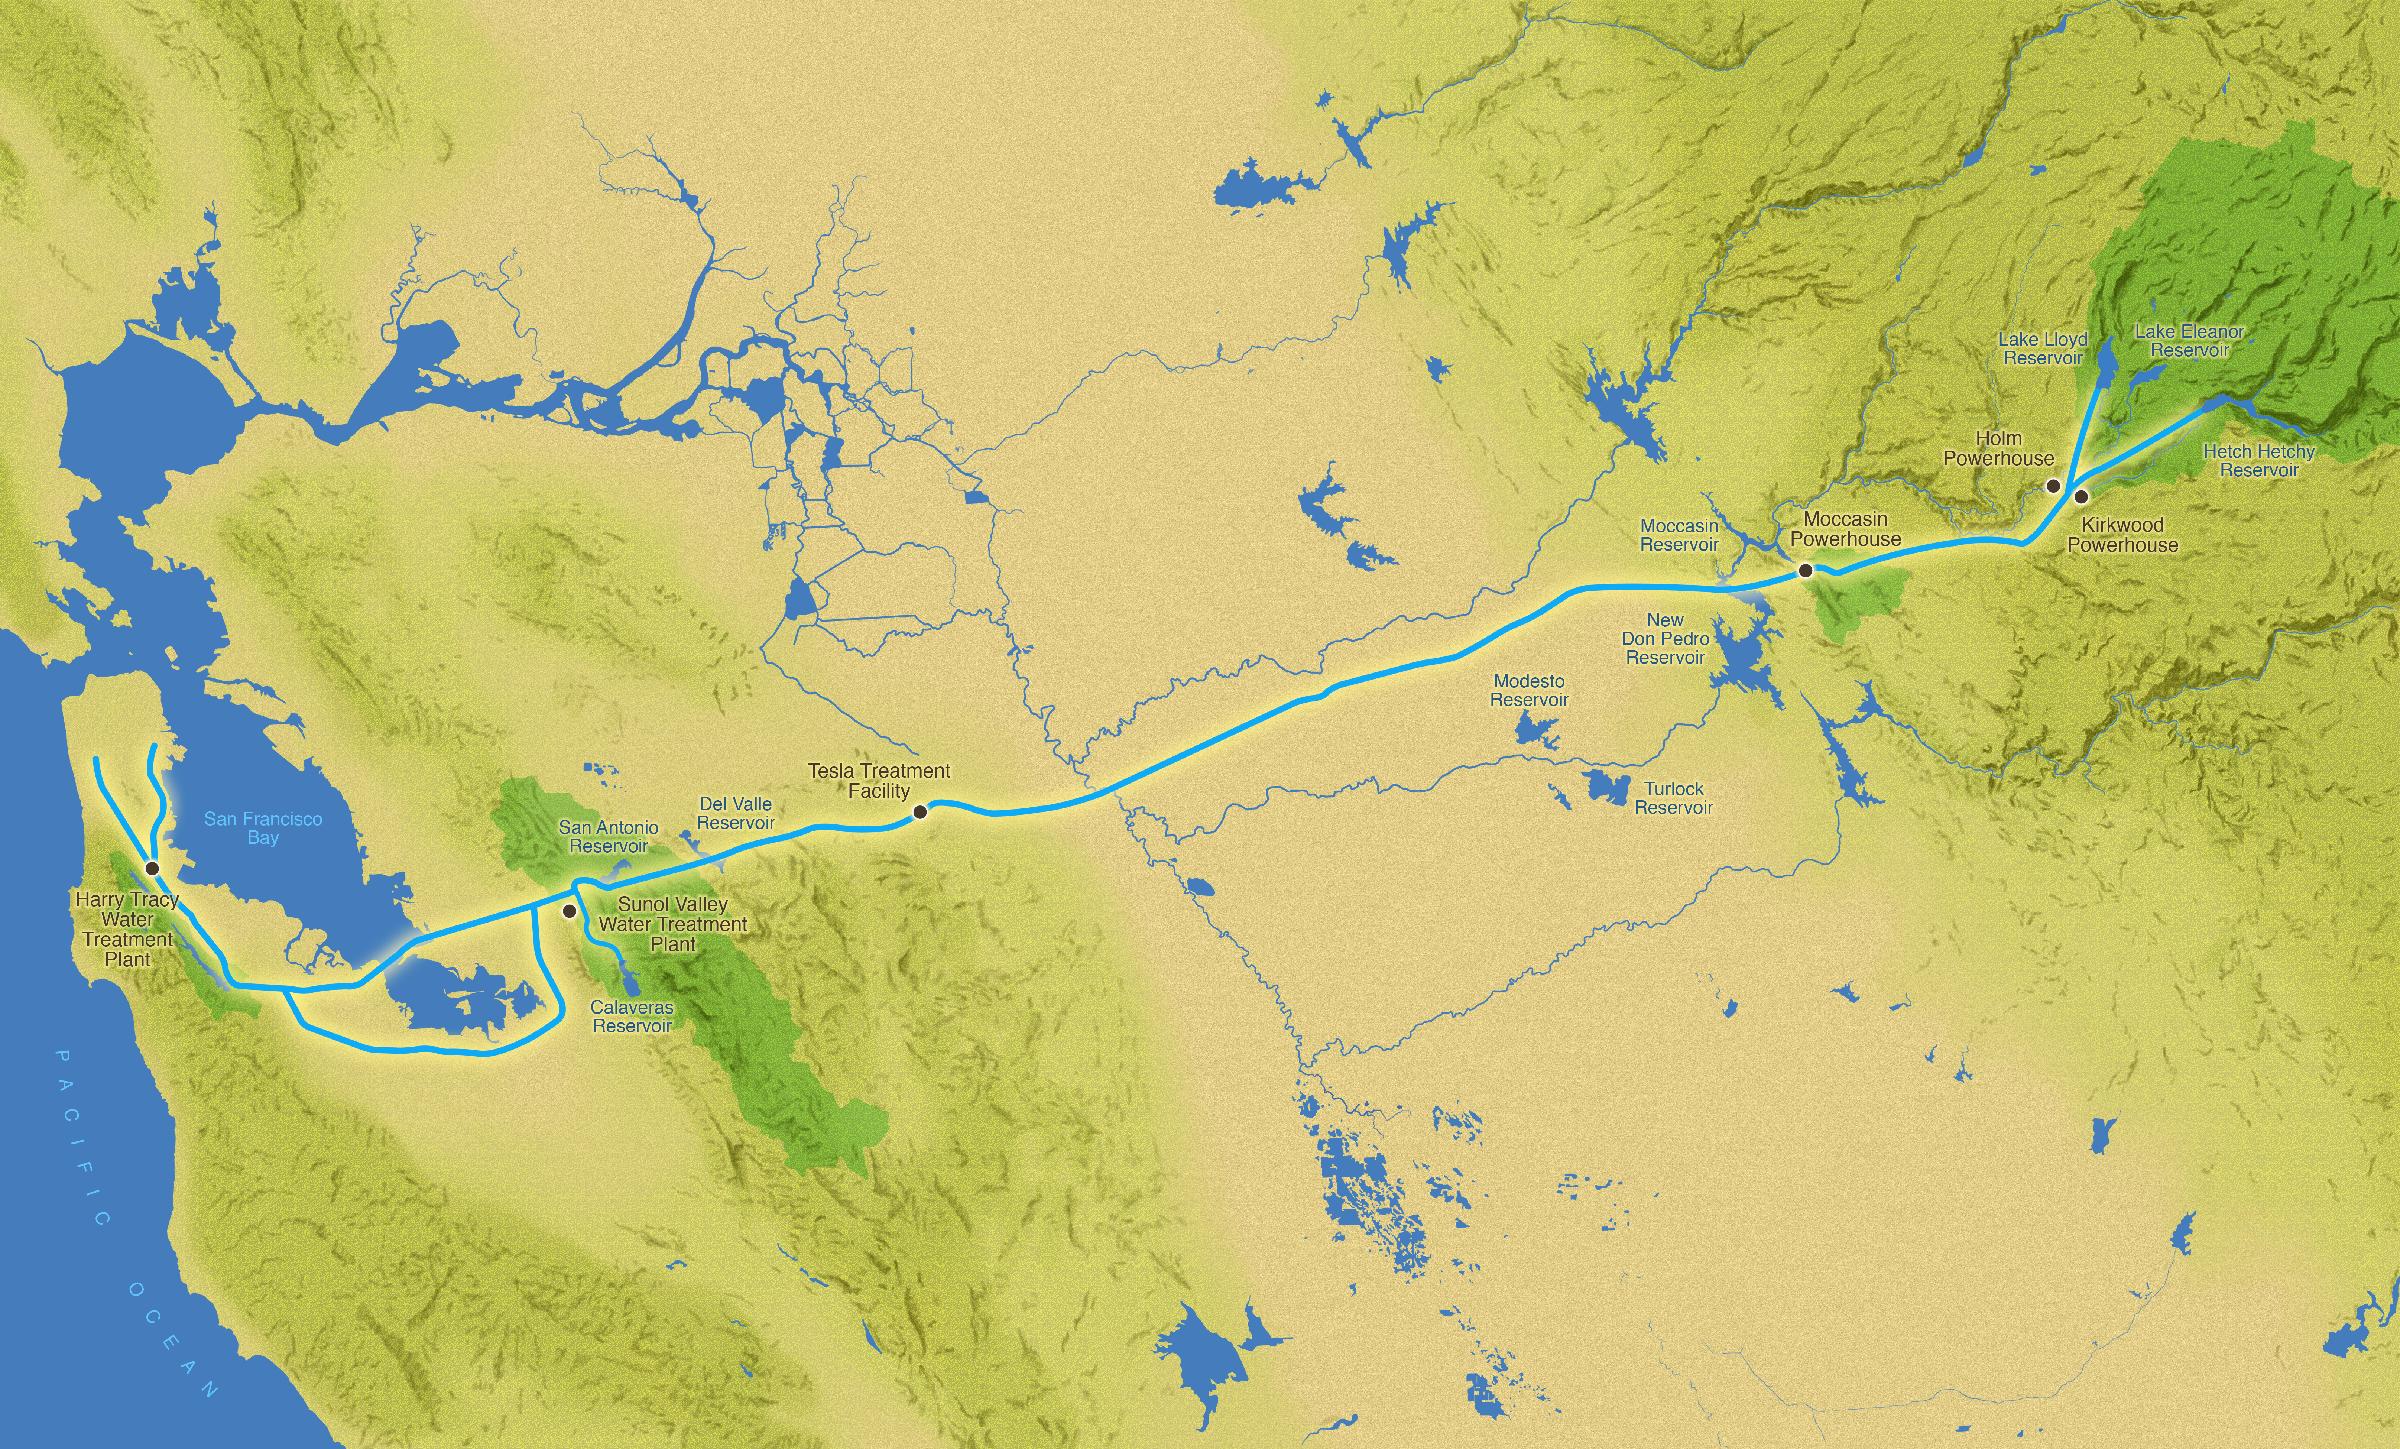 The Acorn Group - Hetch Hetchy Watershed